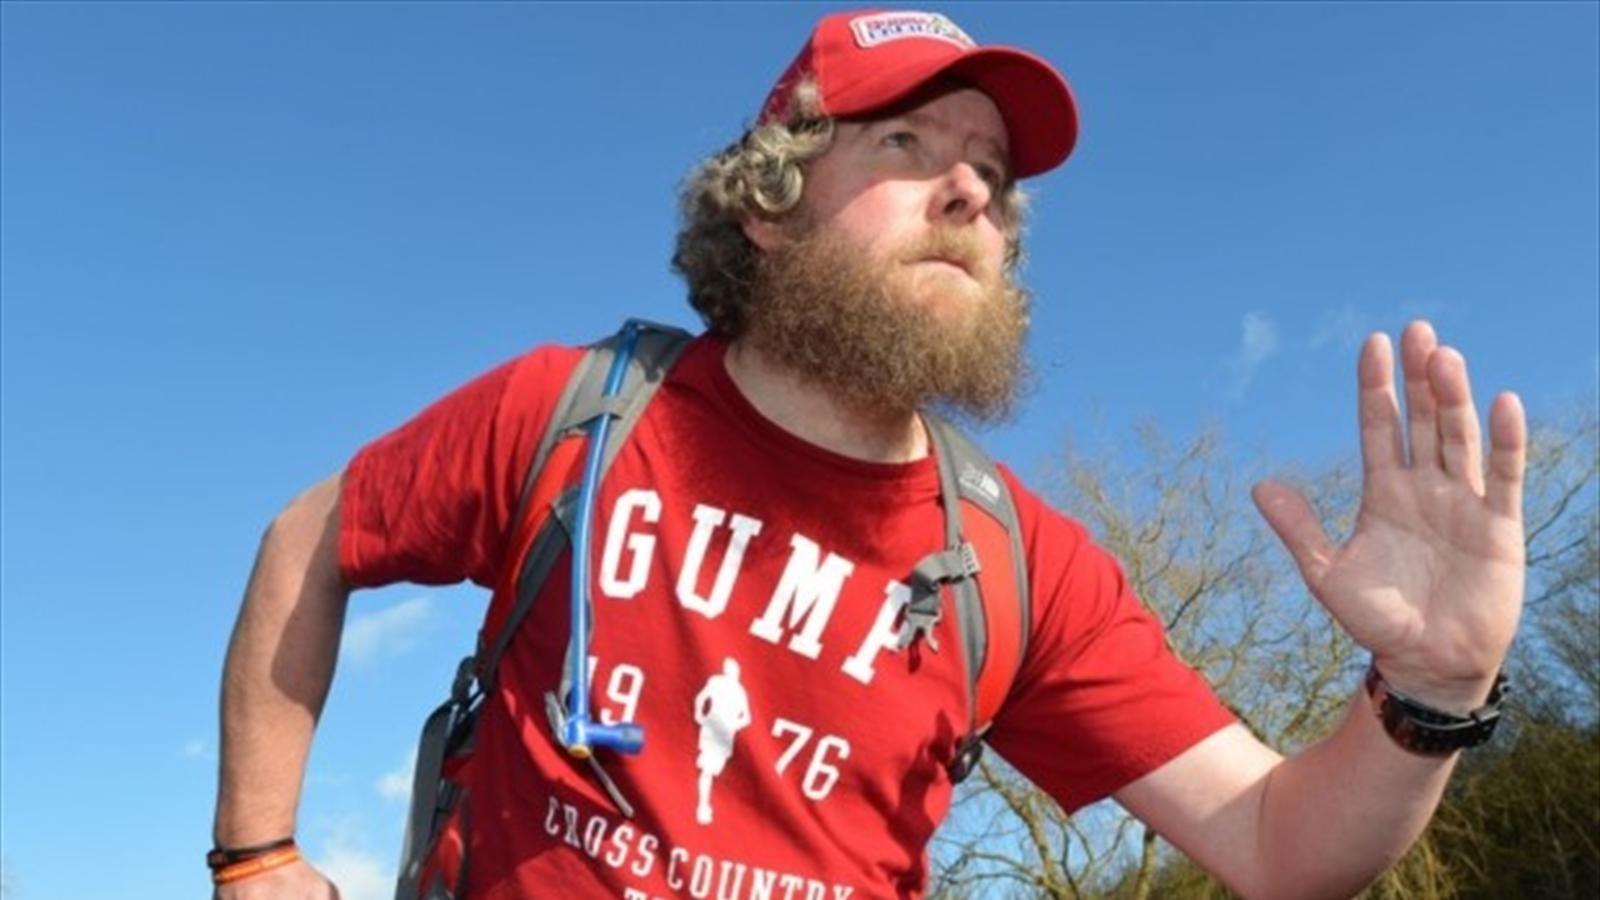 Британец пробежал 42 марафона за 42 дня, одевшись как Форрест Гамп